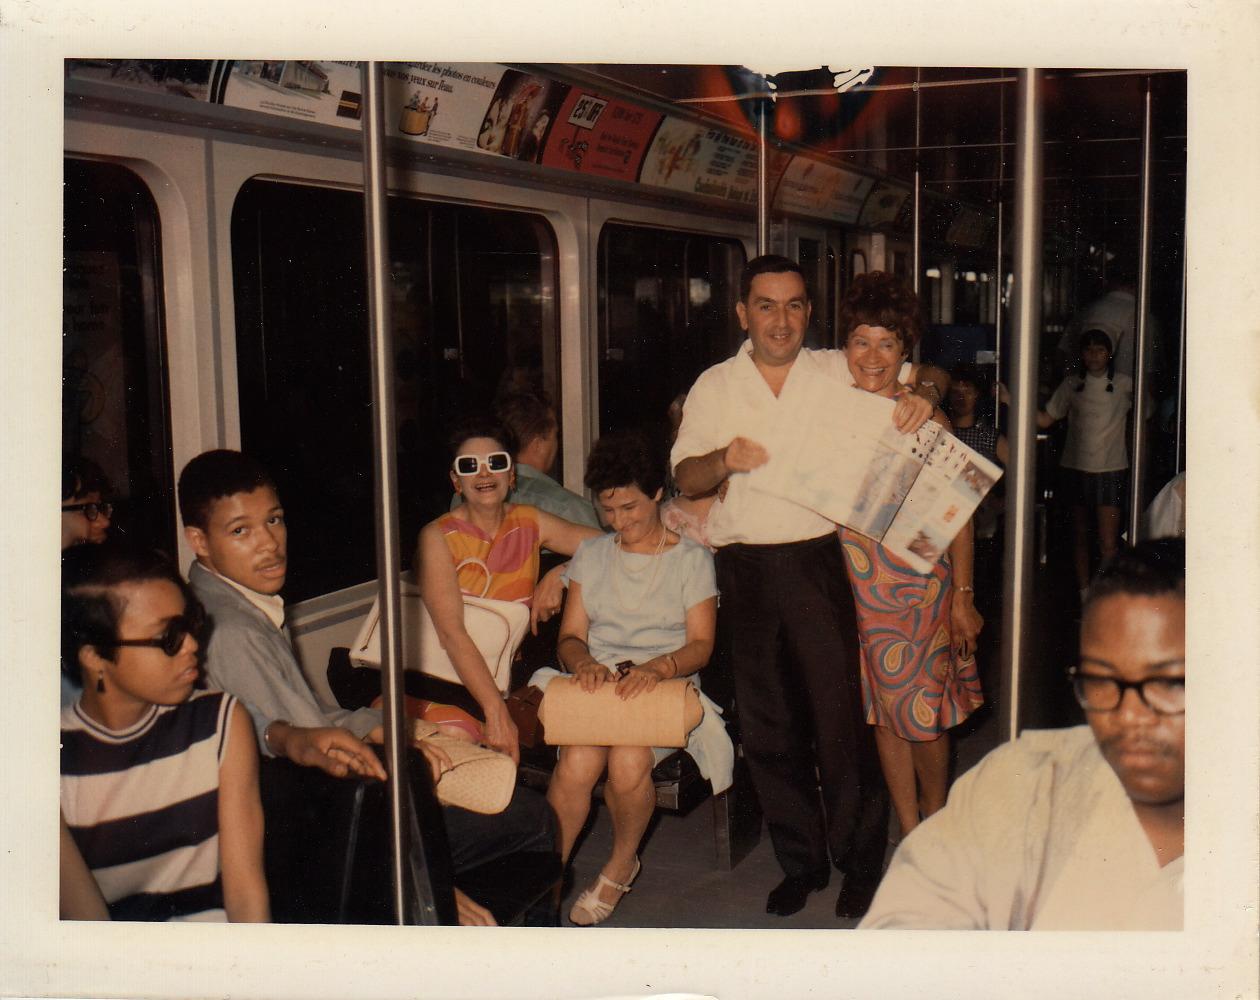 trip-1970s-c